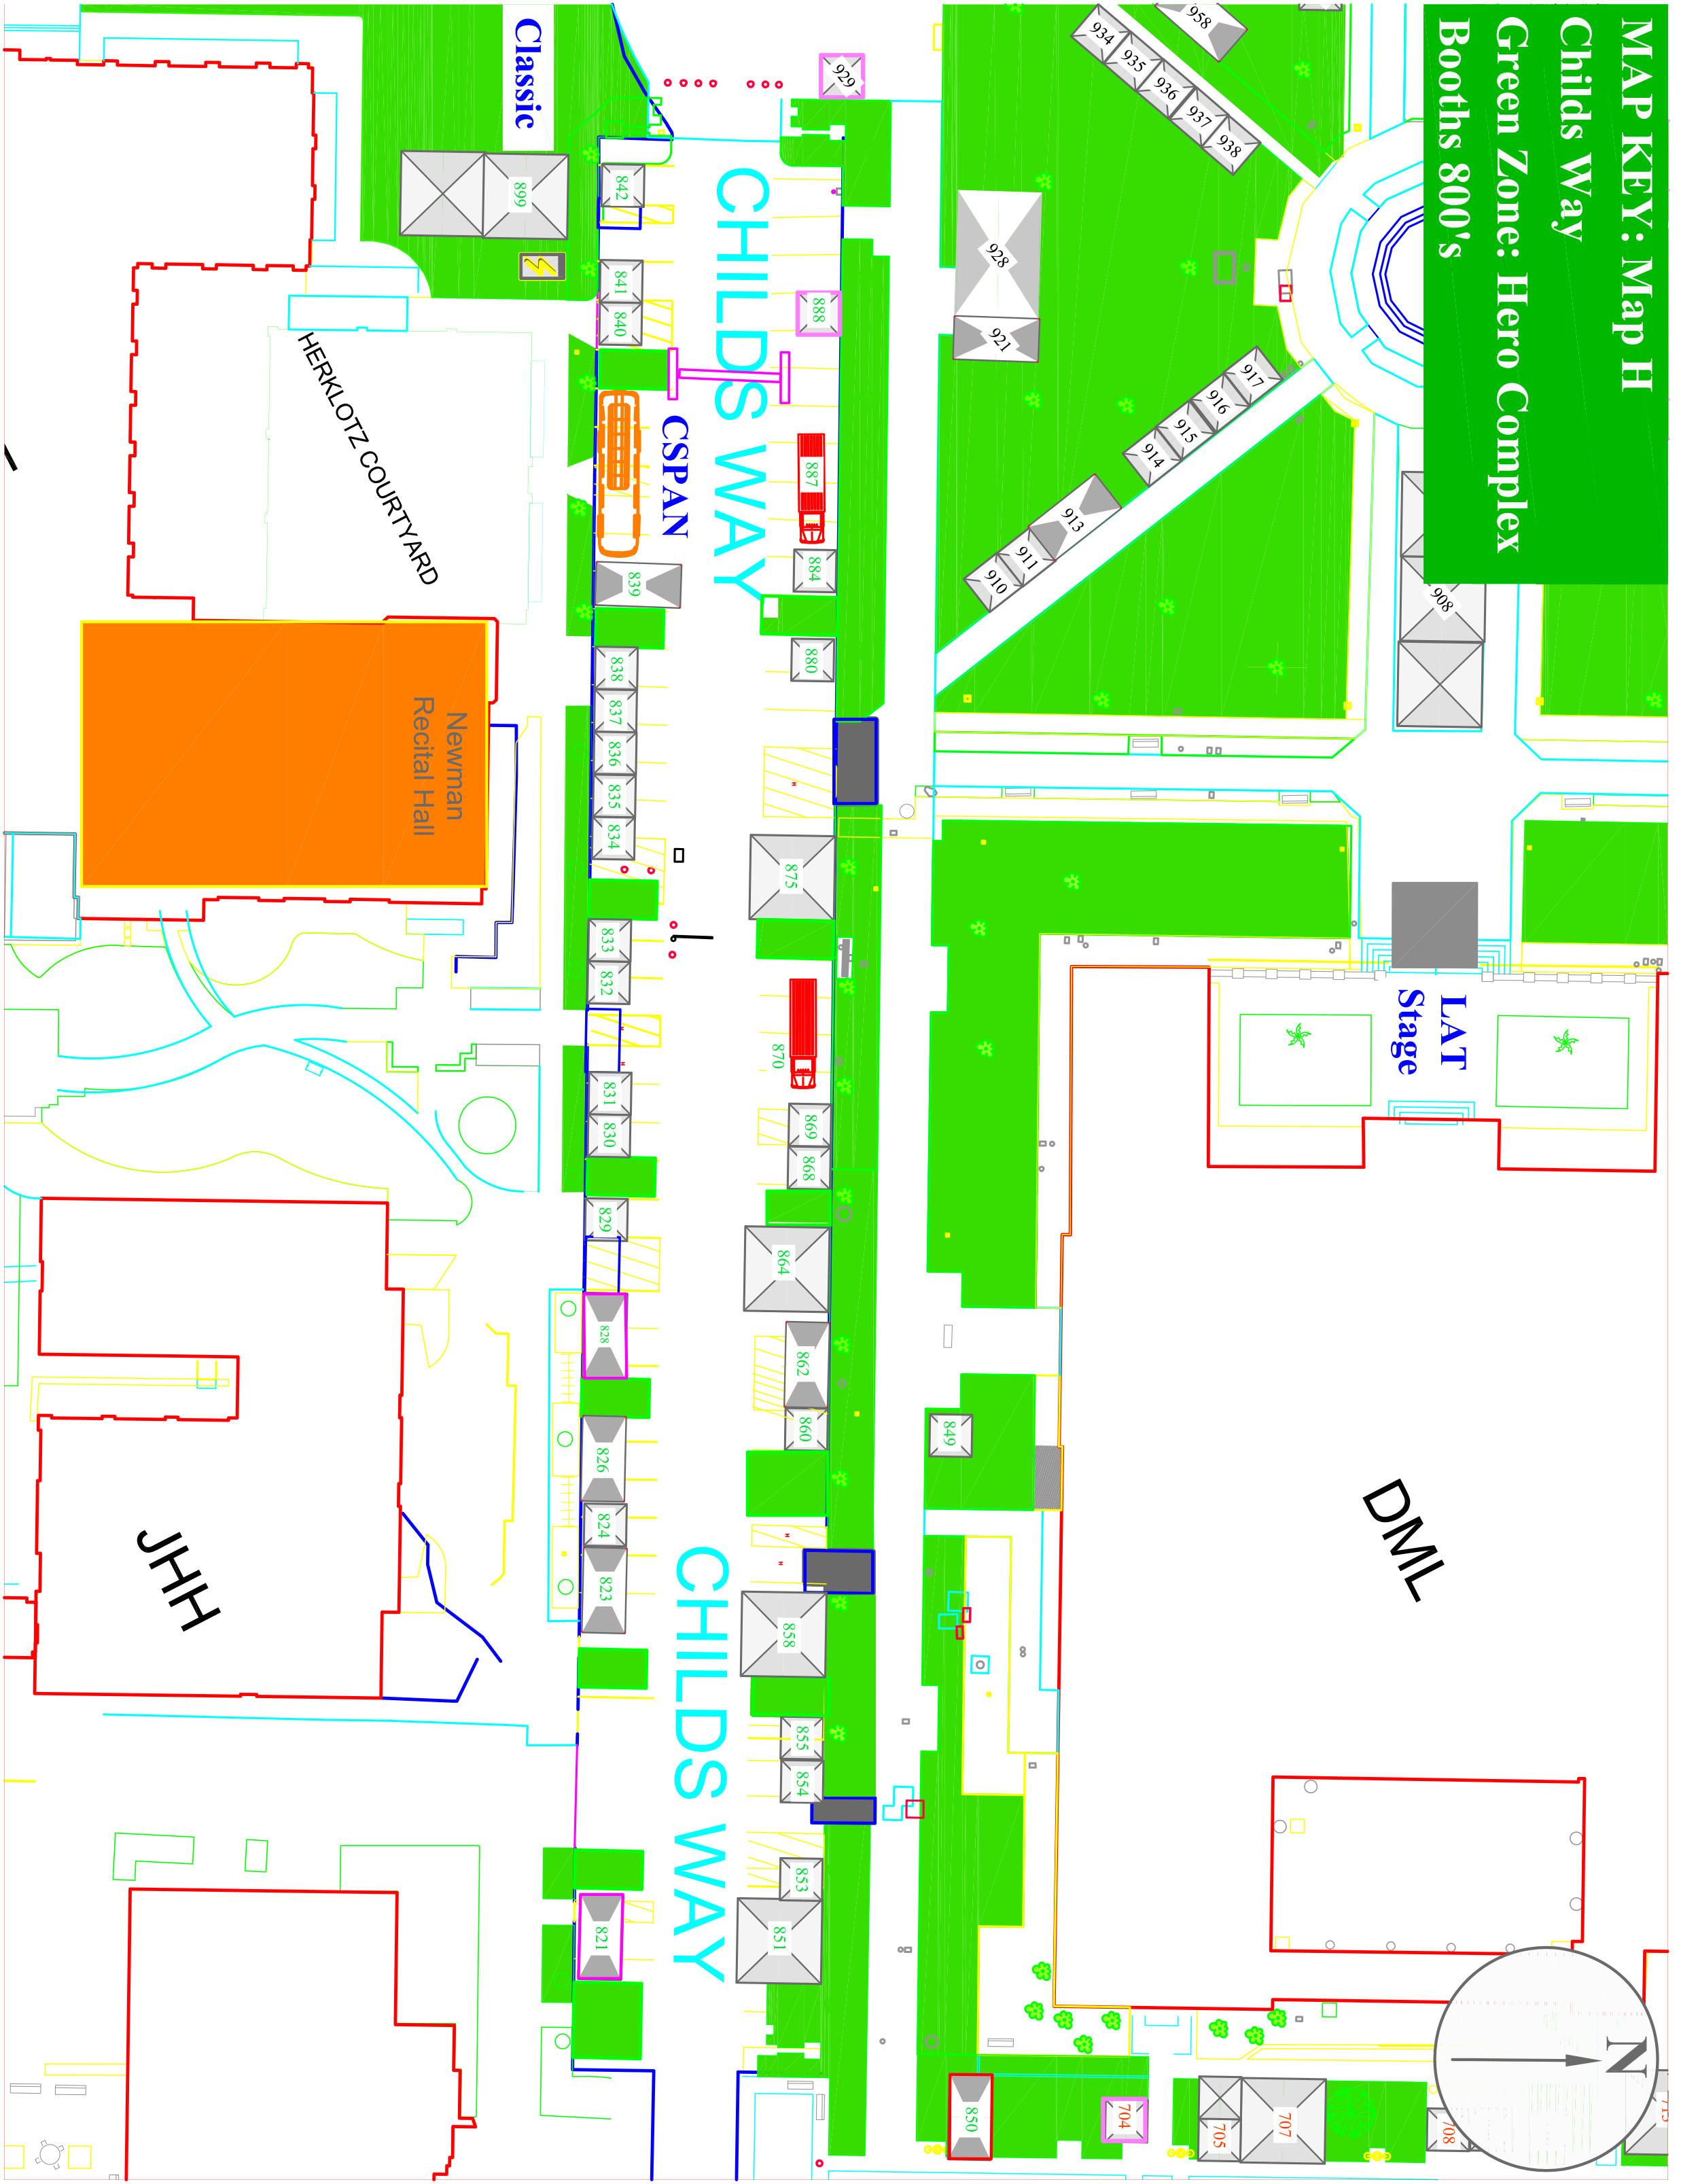 booth_map_823.jpg